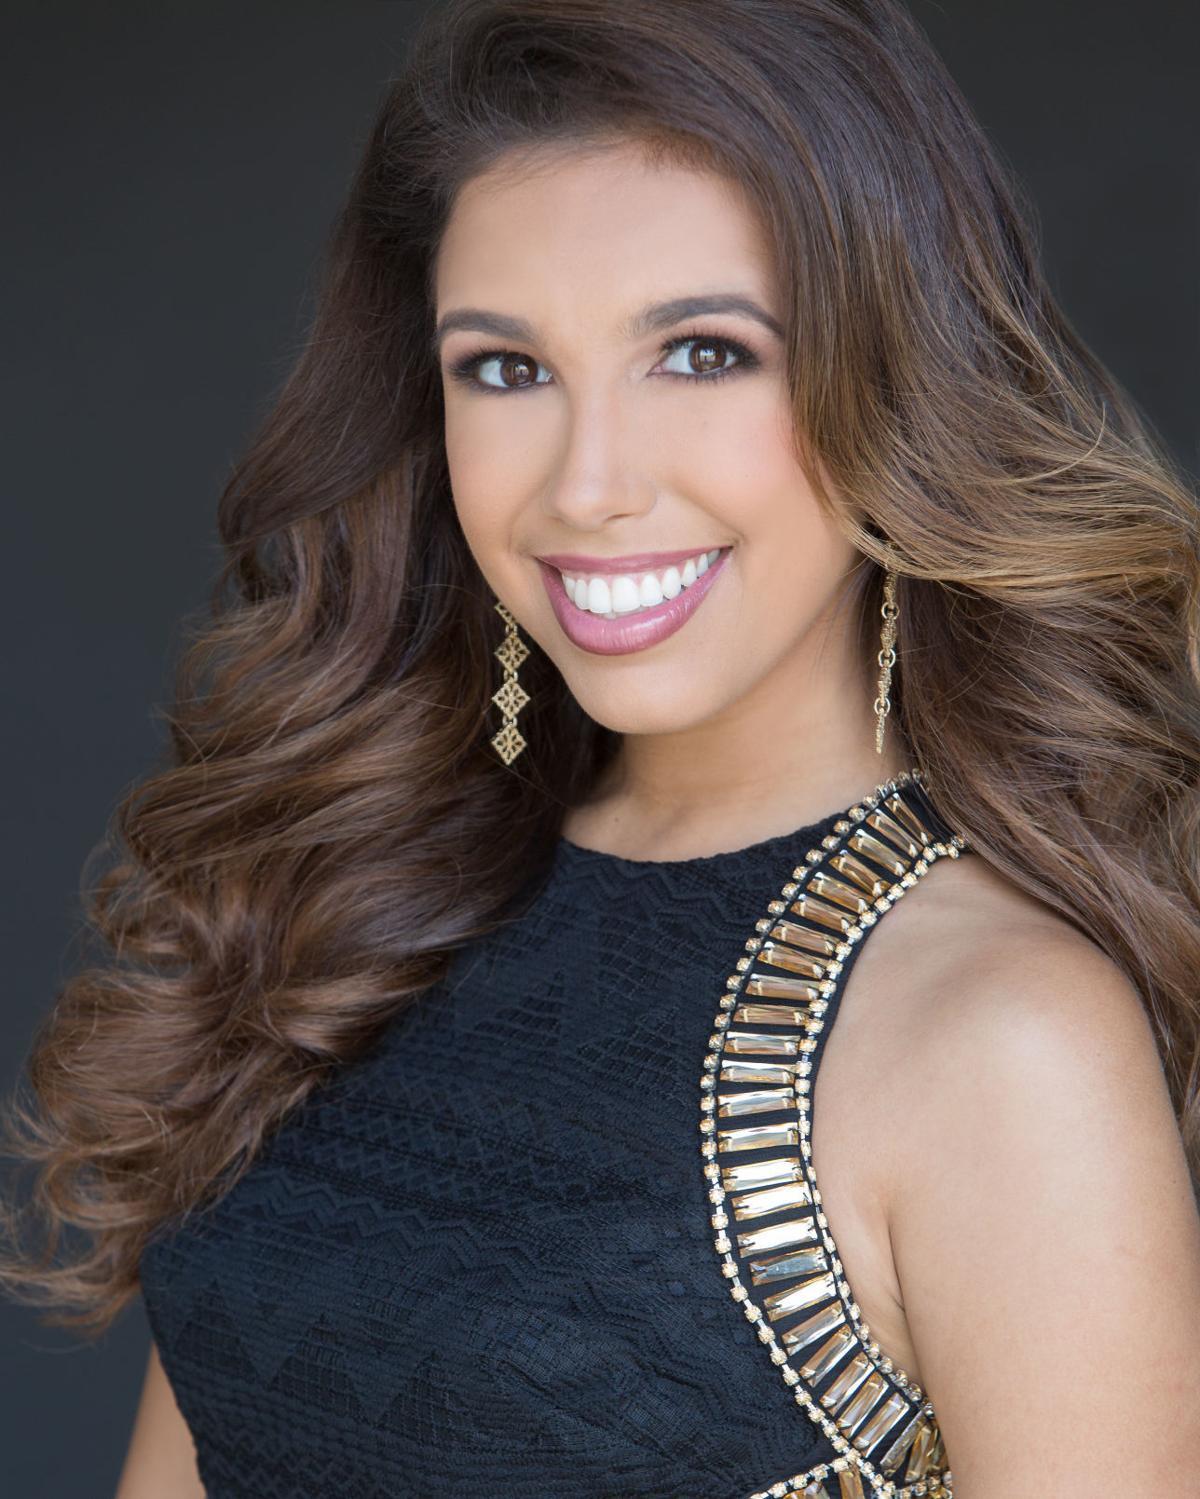 Miss North Carolina 2017 Victoria Huggins